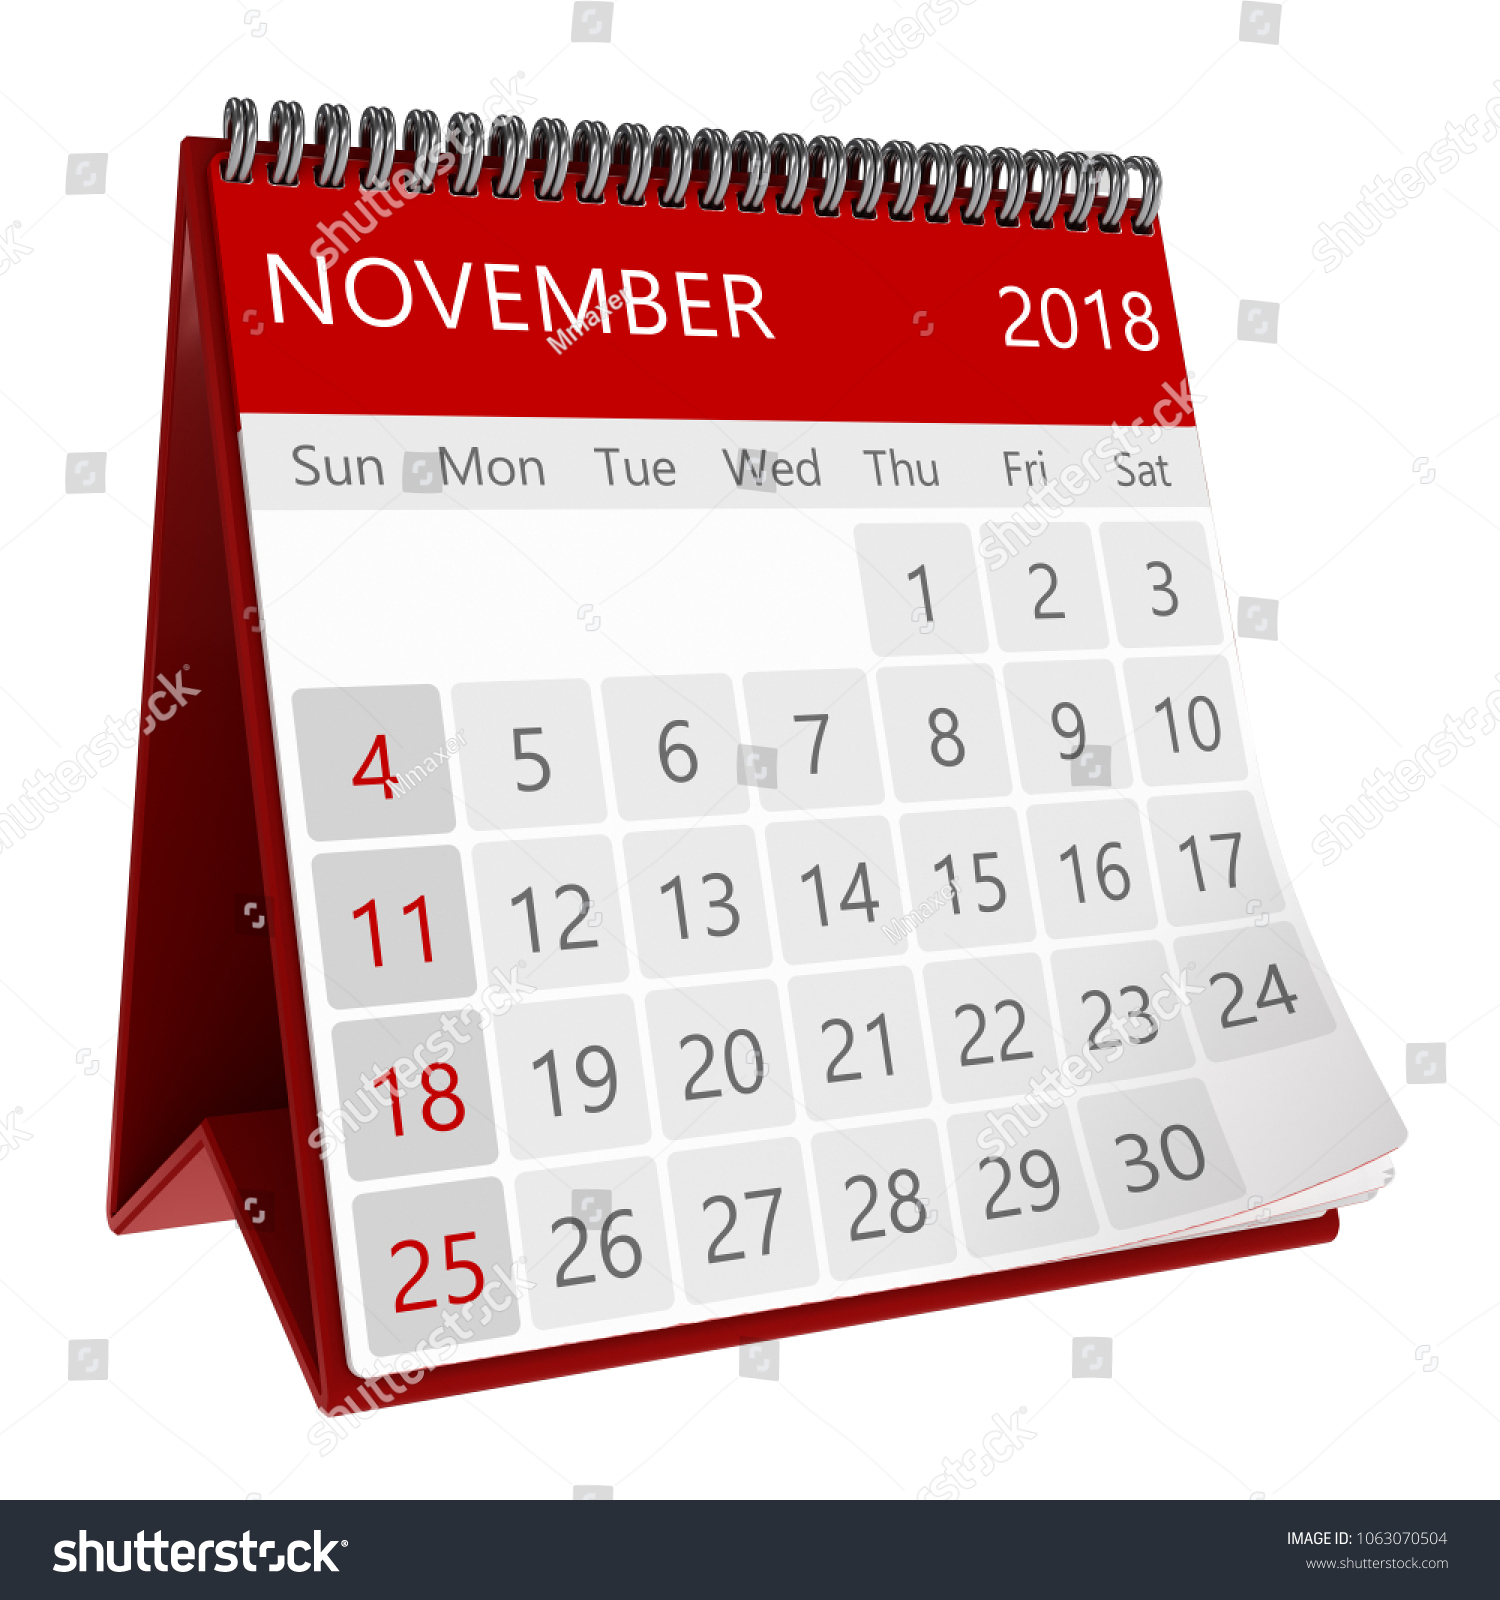 Стоковая Иллюстрация «3D Illustration Red Monthly Calendar For Sun Page 3 Calenders